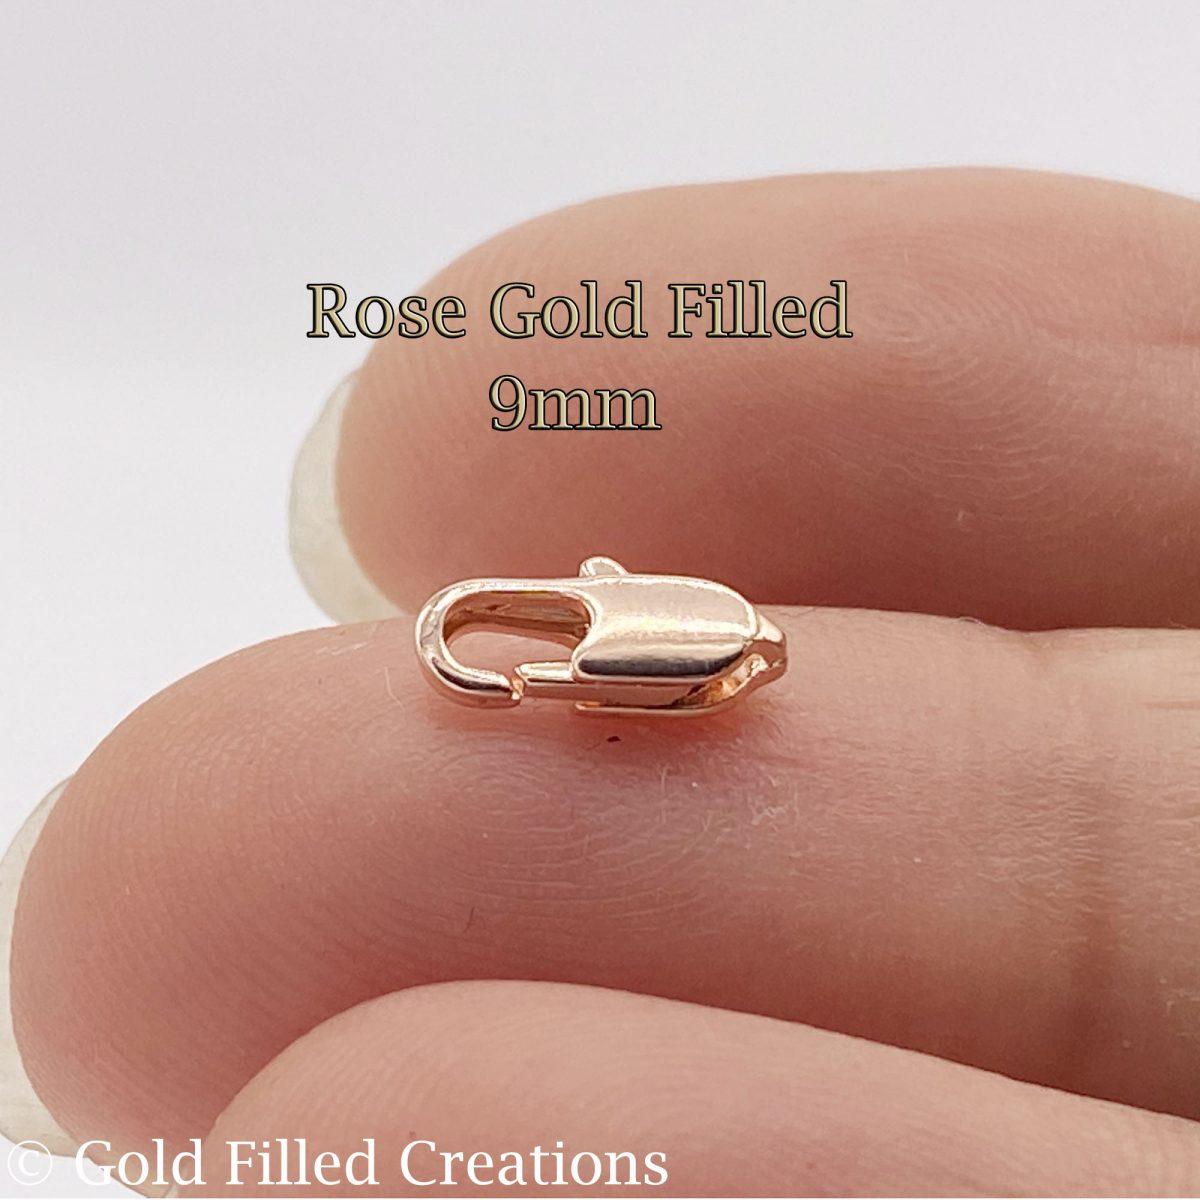 Rose Gold filled lobster clasp